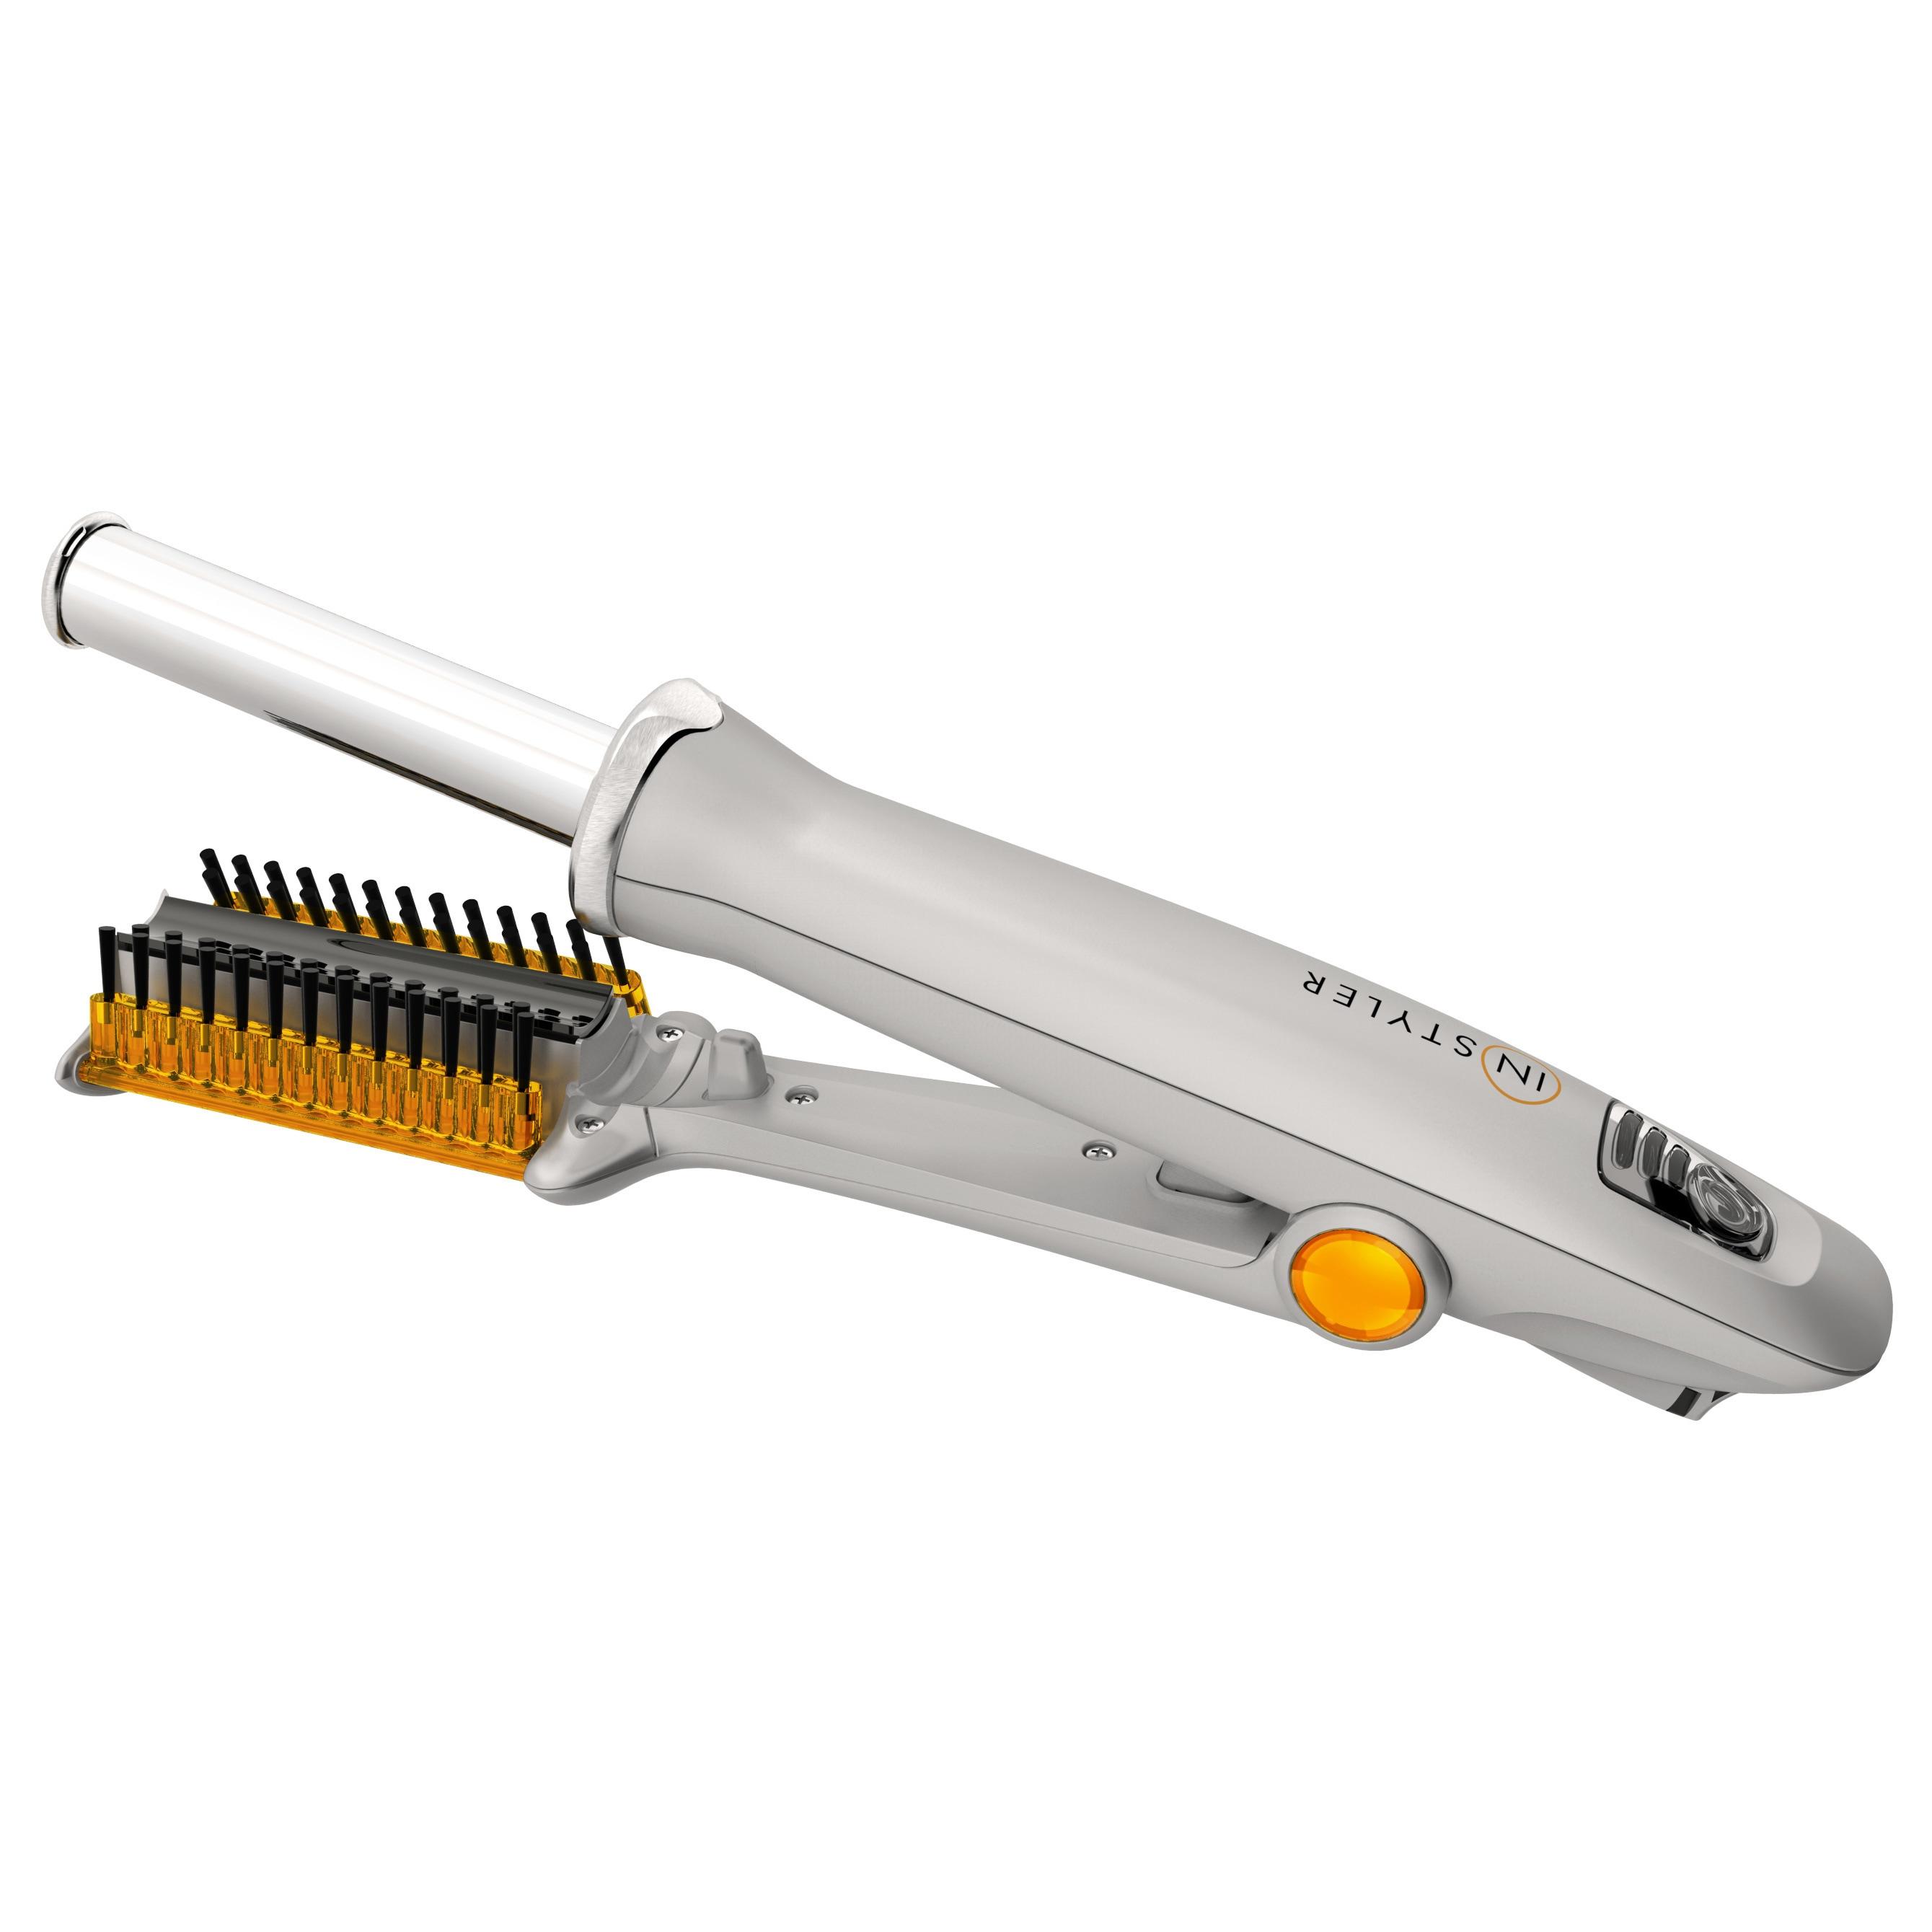 InStyler 3/4-inch 2-way Rotating Hair Styler, Silver, Siz...